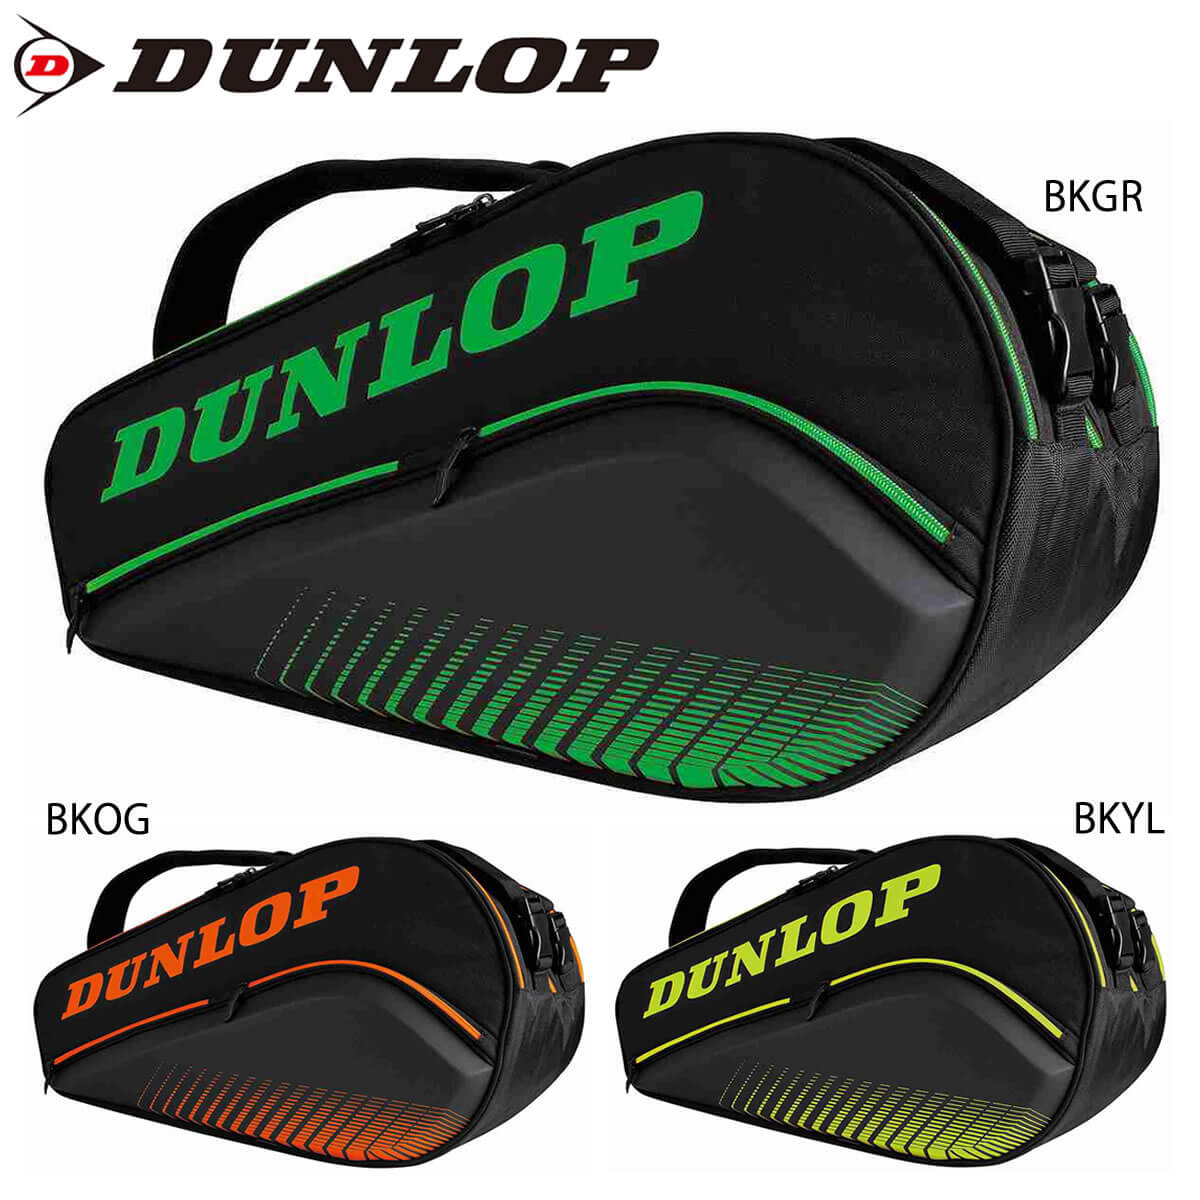 DUNLOP DPC2080 ラケットバッグ テニスバッグ 2020年春夏モデル ダンロップ 【取り寄せ】